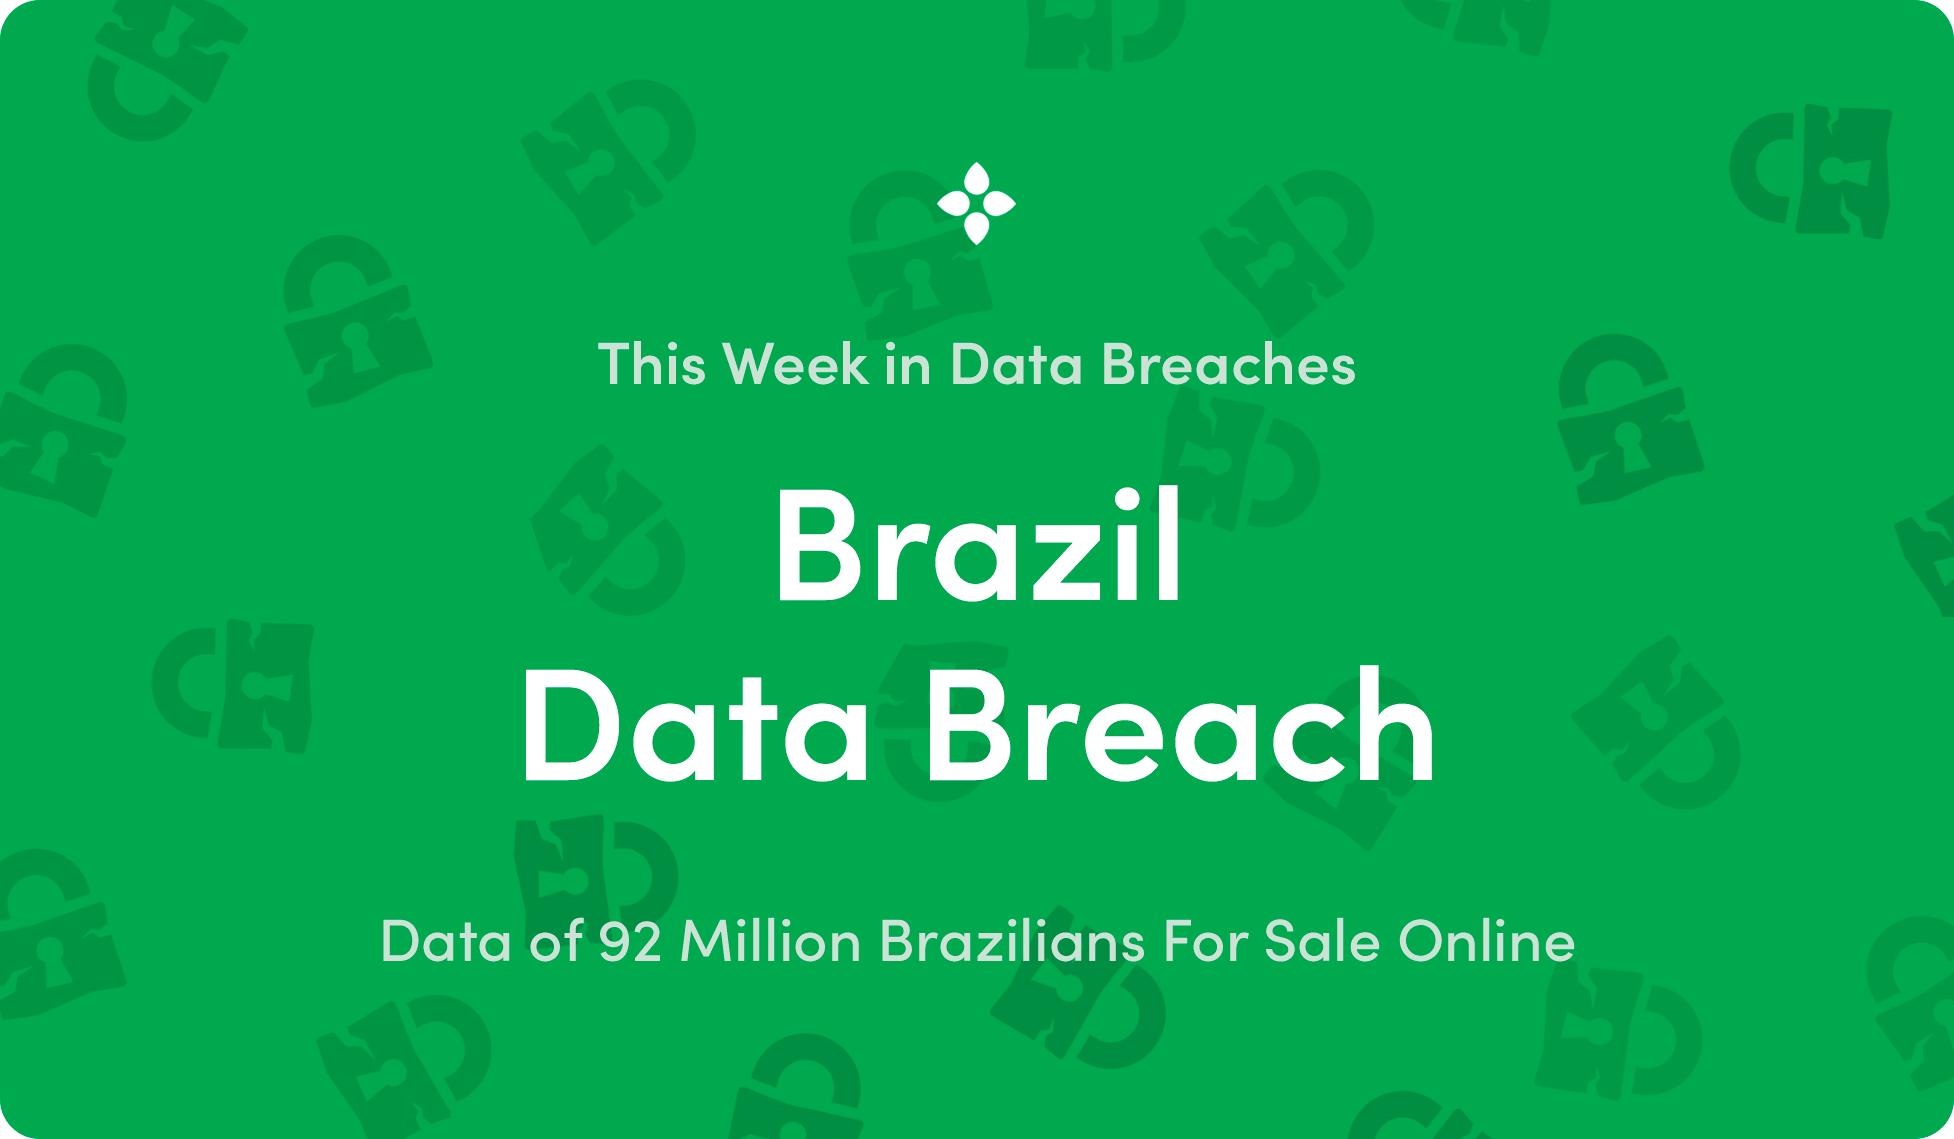 brazil data breach